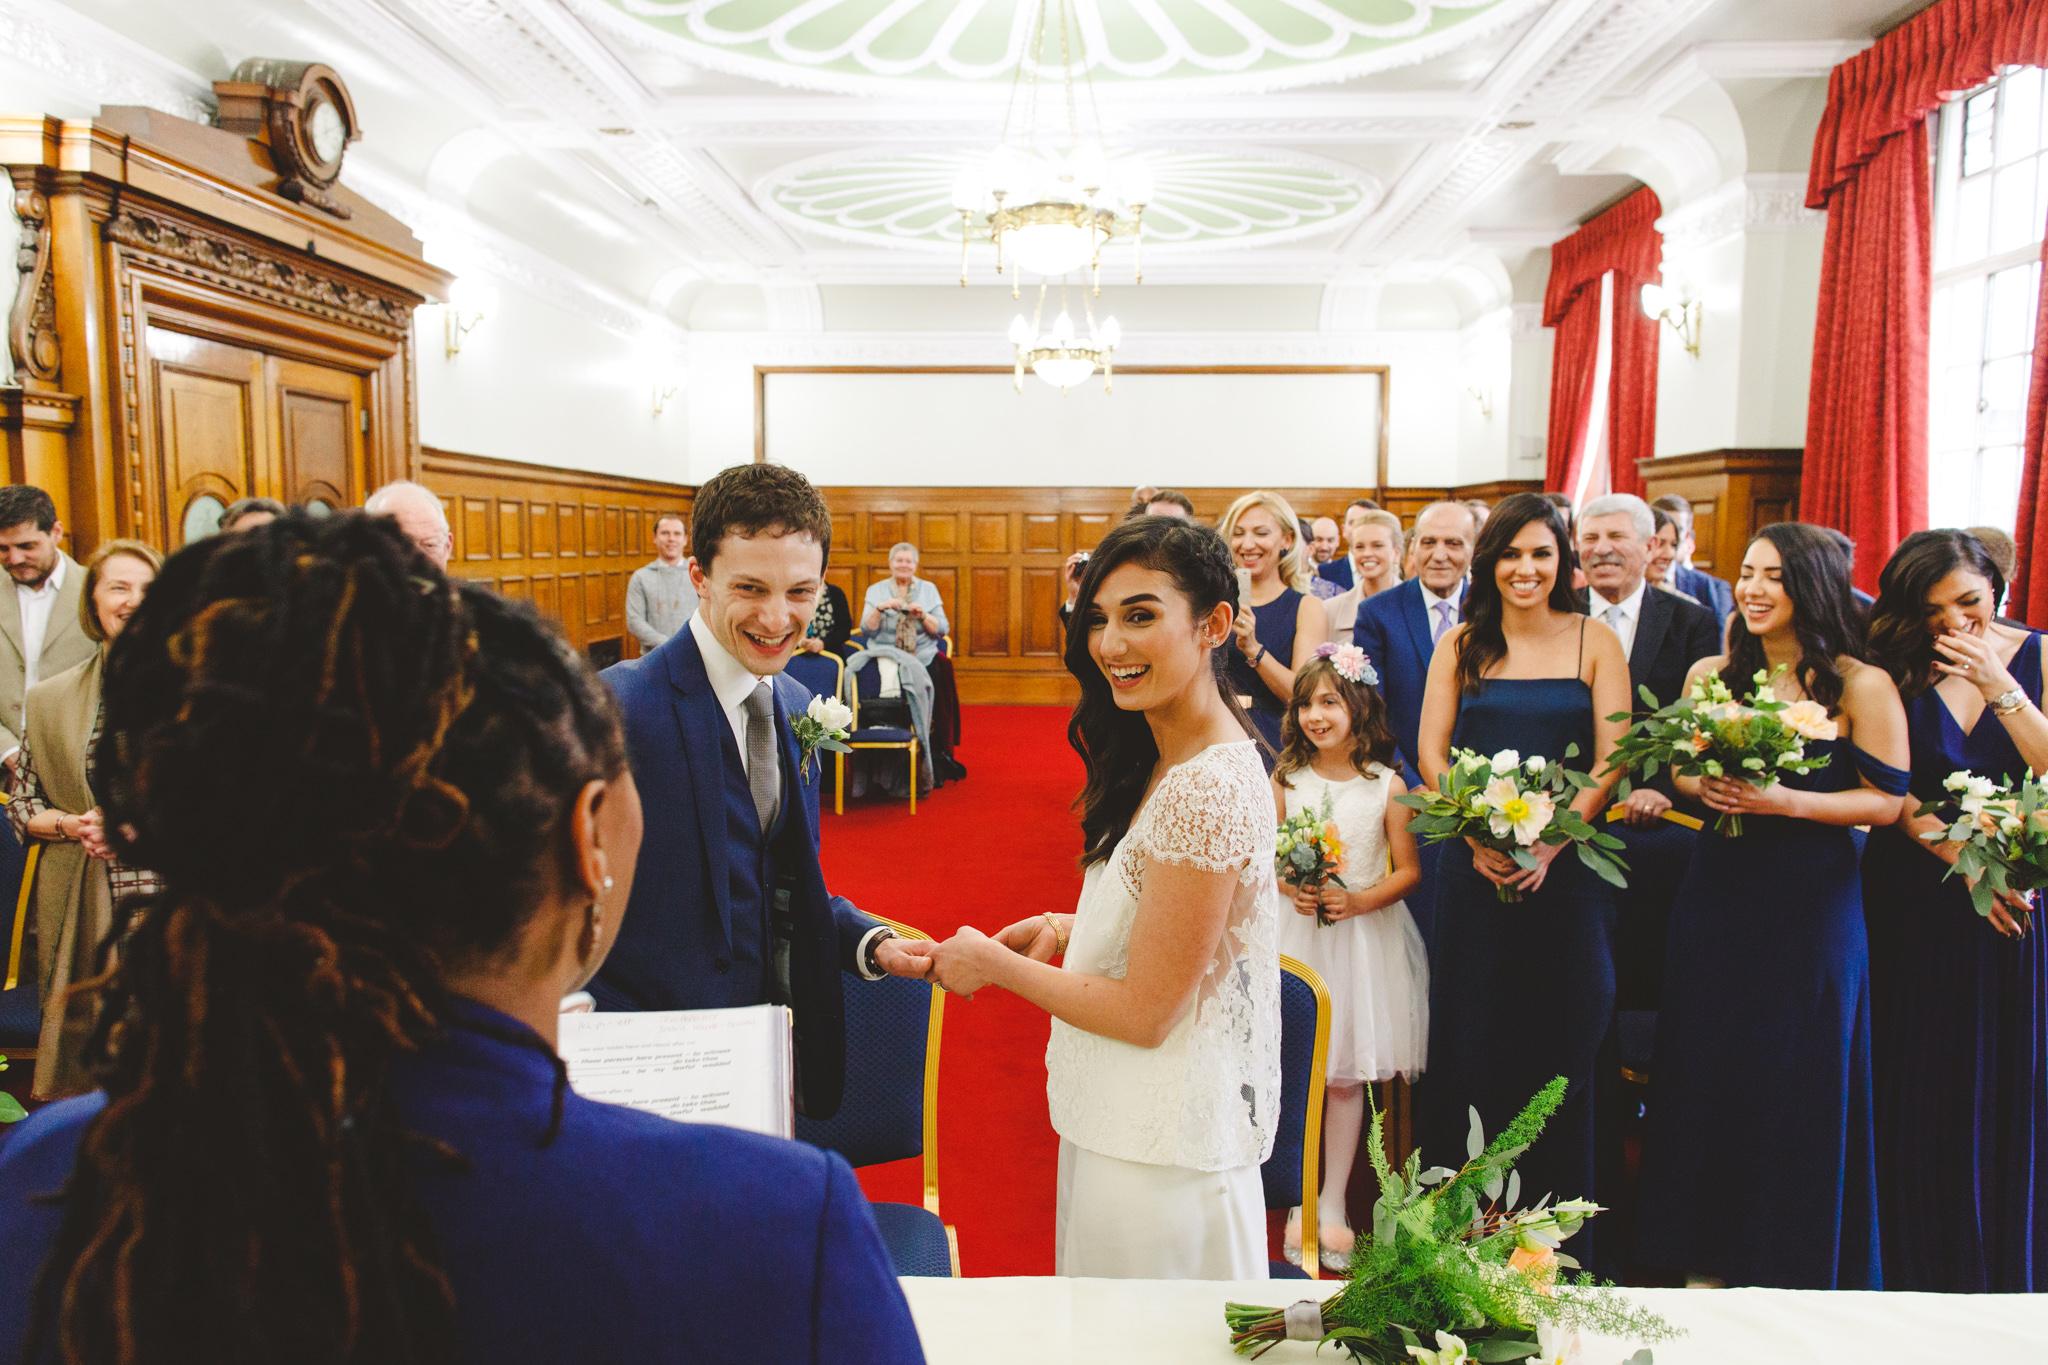 derbyshire-wedding-photographer-camera-hannah-2.jpg